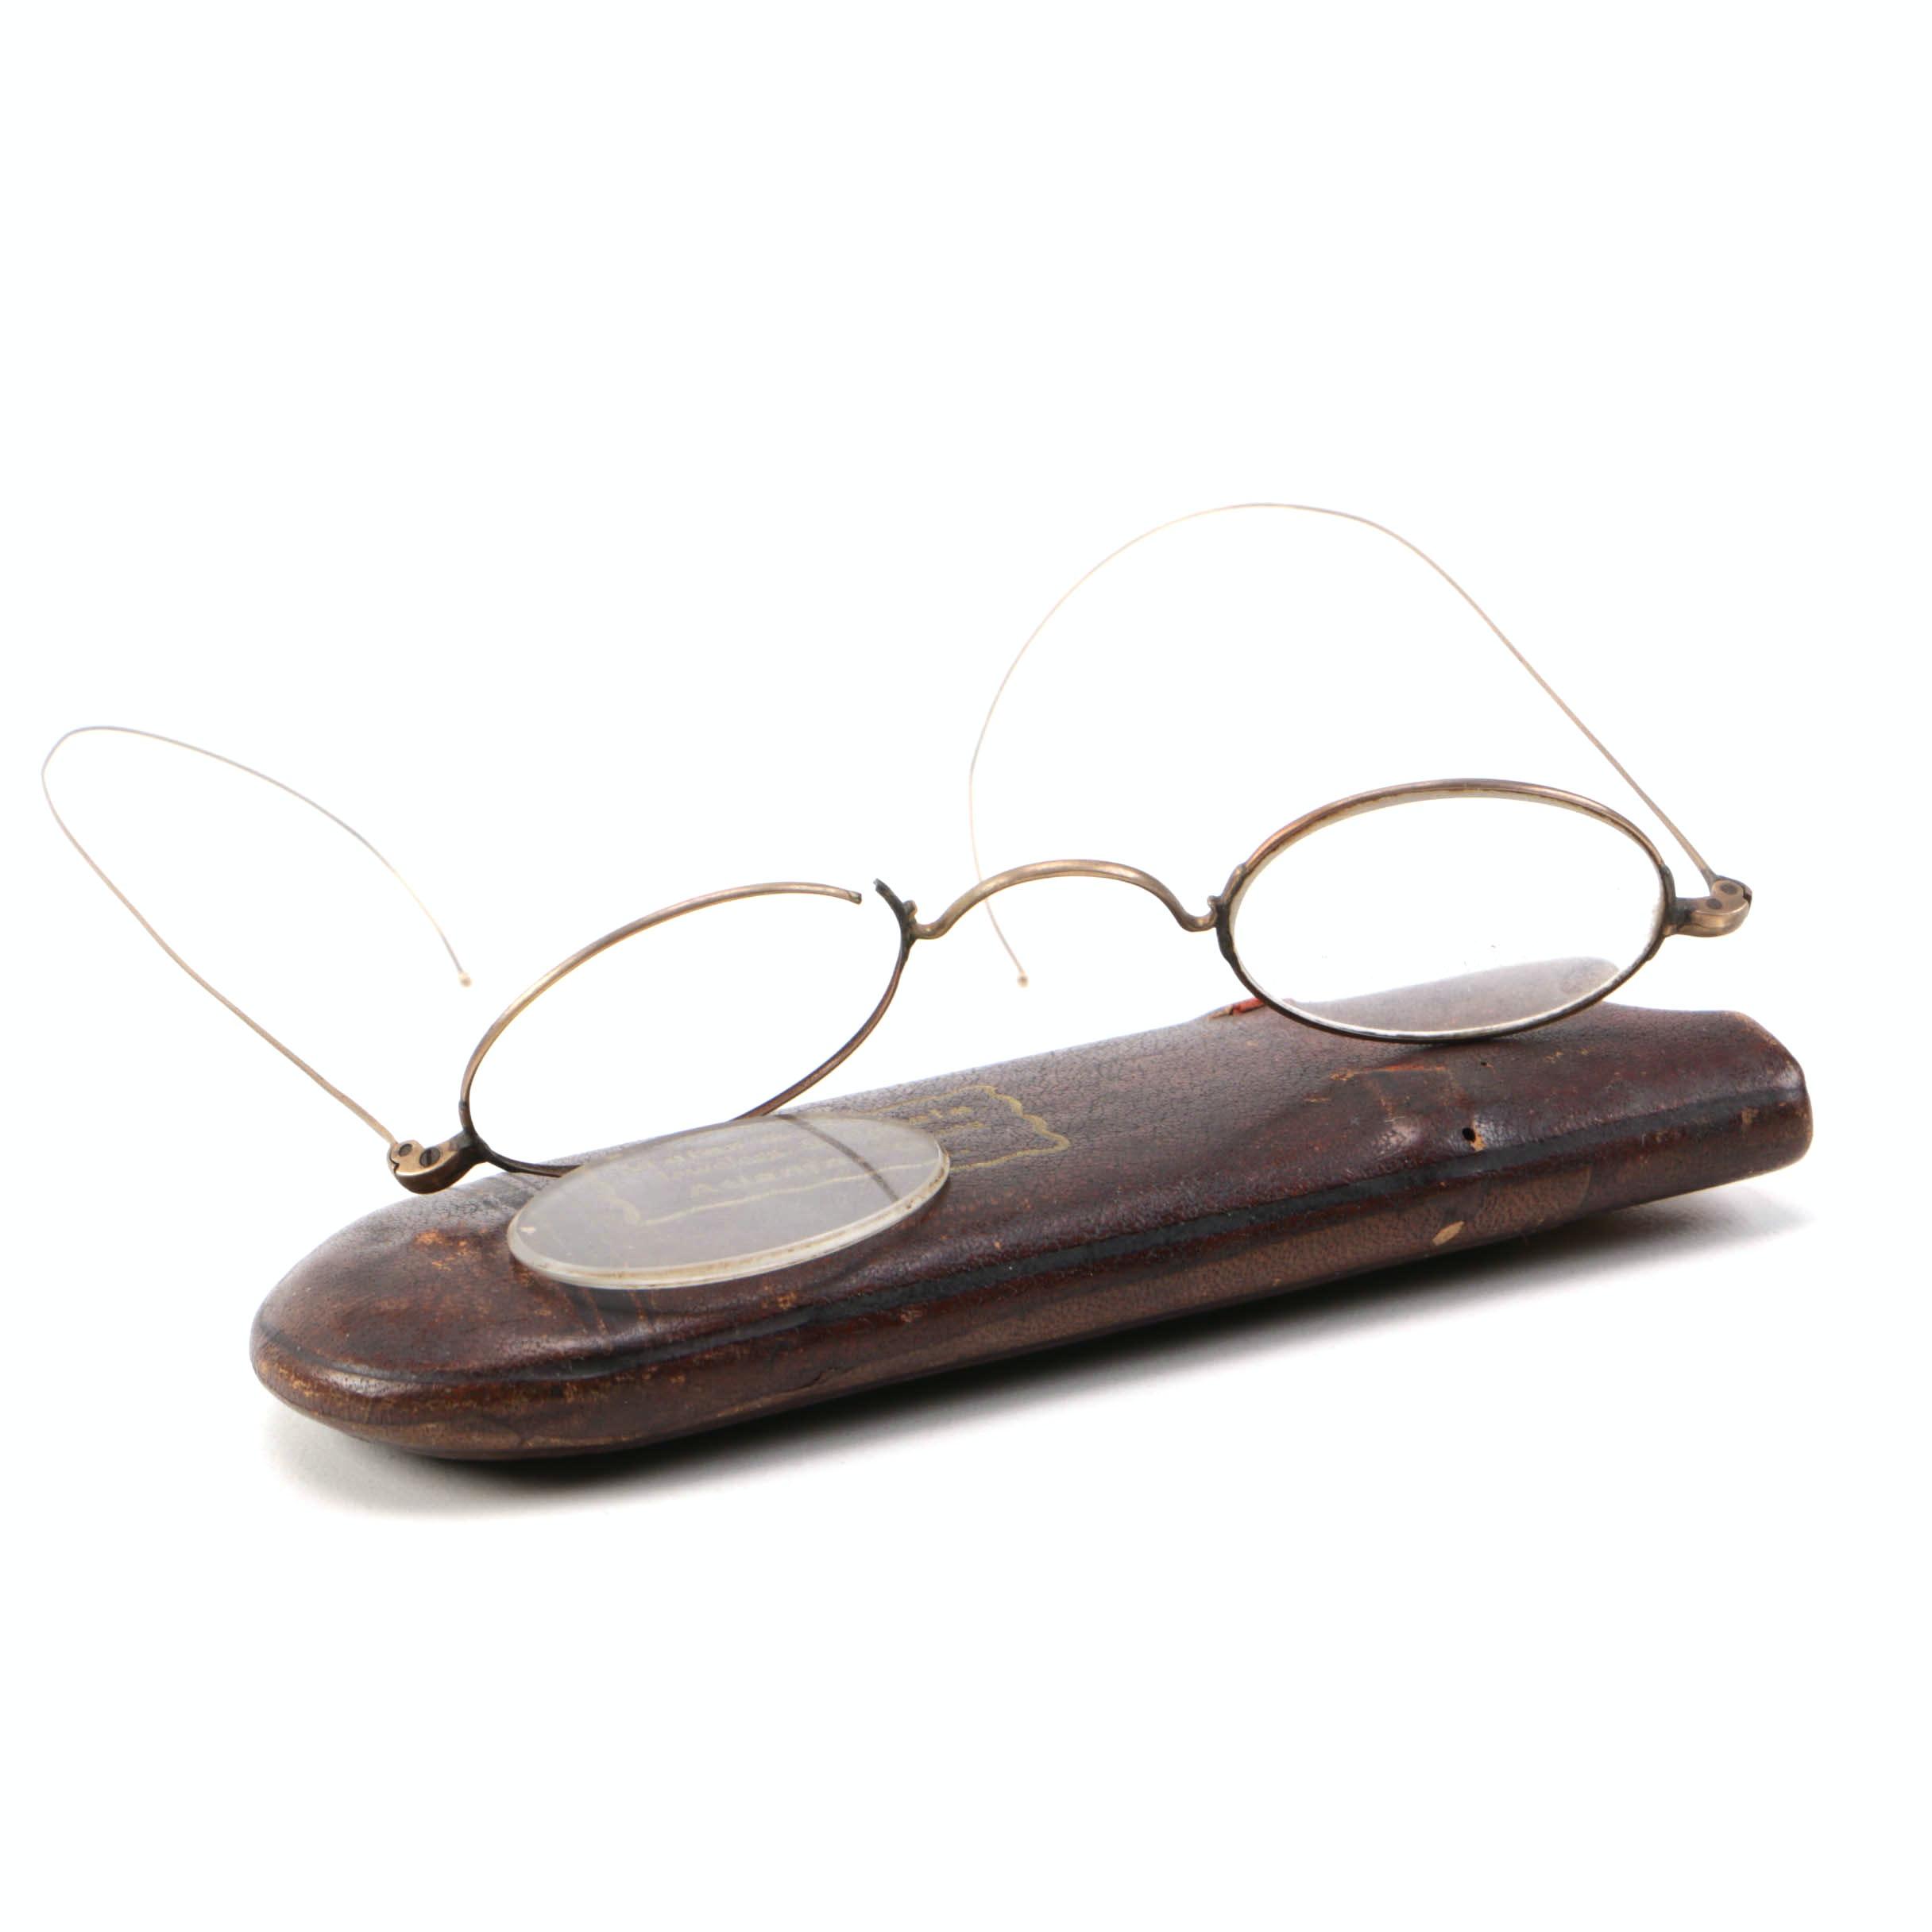 Maler & Berkele Jewelers & Opticians Glasses and Case